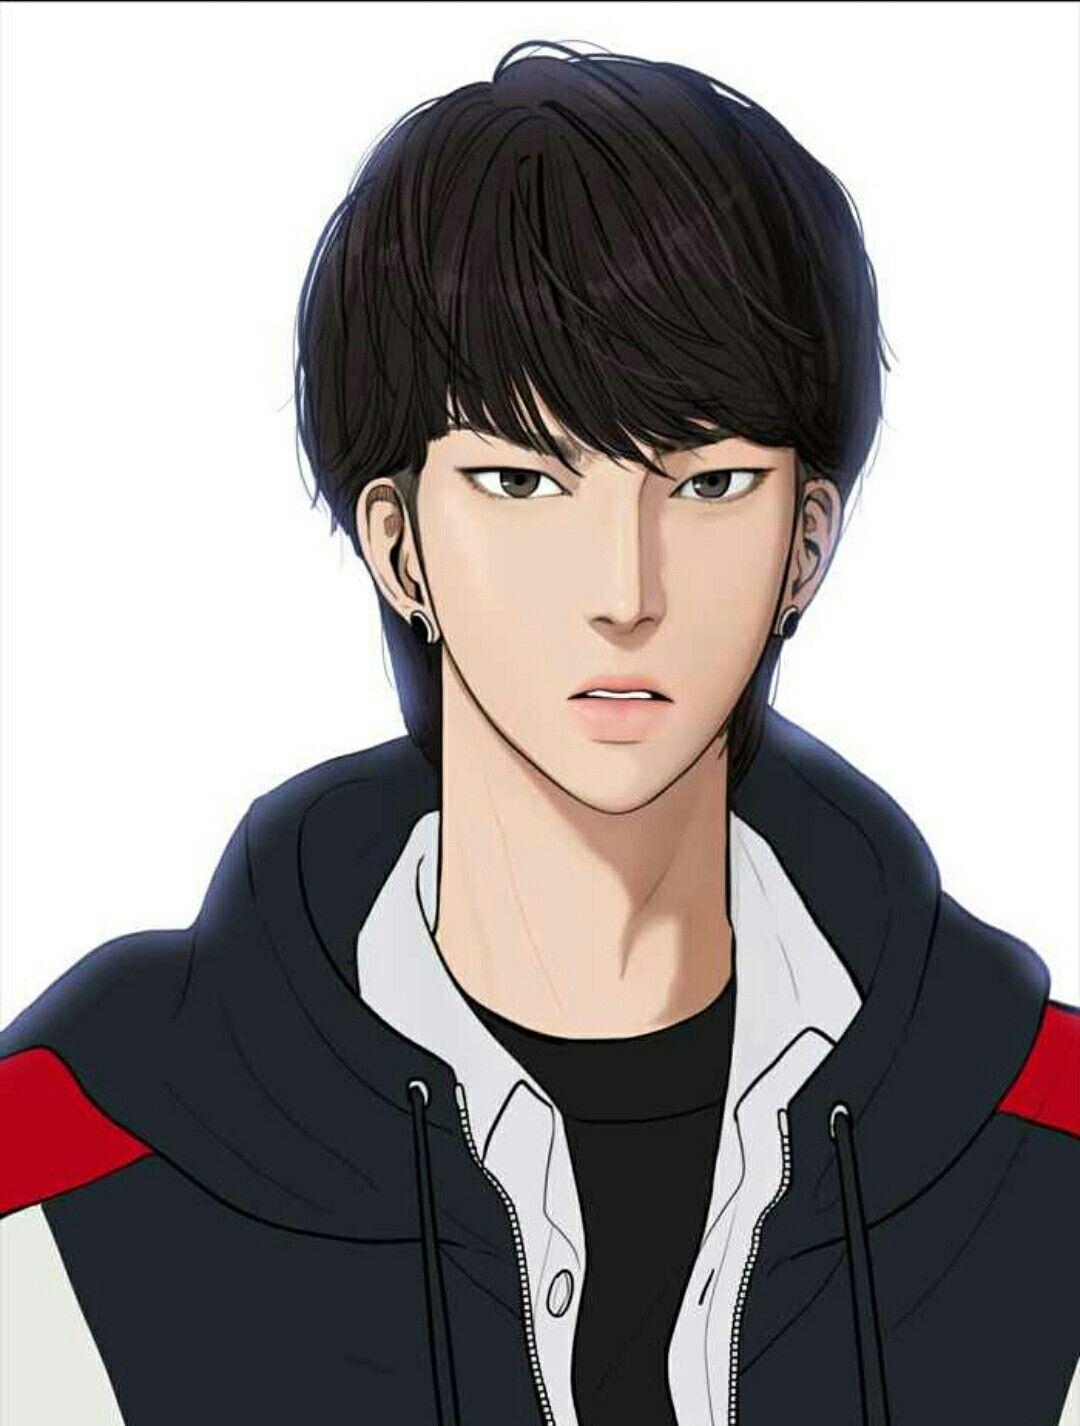 Seojun Han From Webtoon True Beauty The Secret Of Angel By Yaongyi Animasi Baju Anak Anak